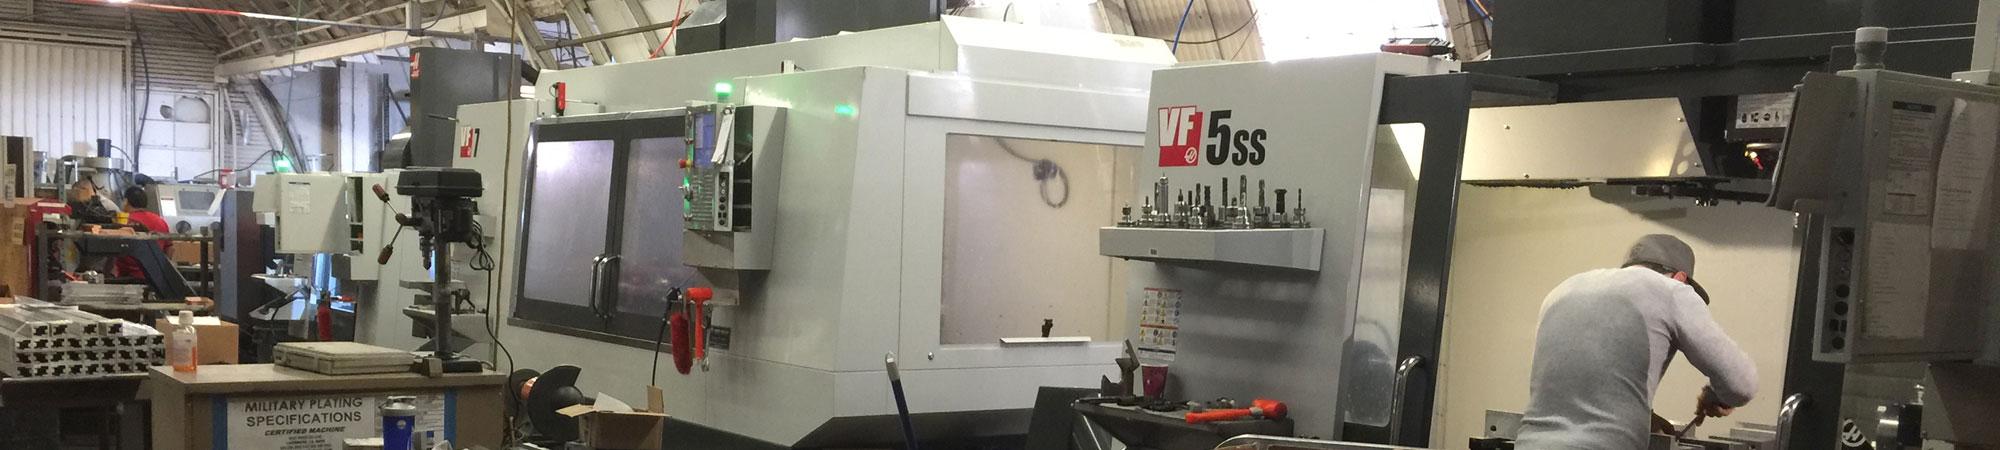 Bay Area Metal Fabrication Machine Shop Manufacturing Hayward